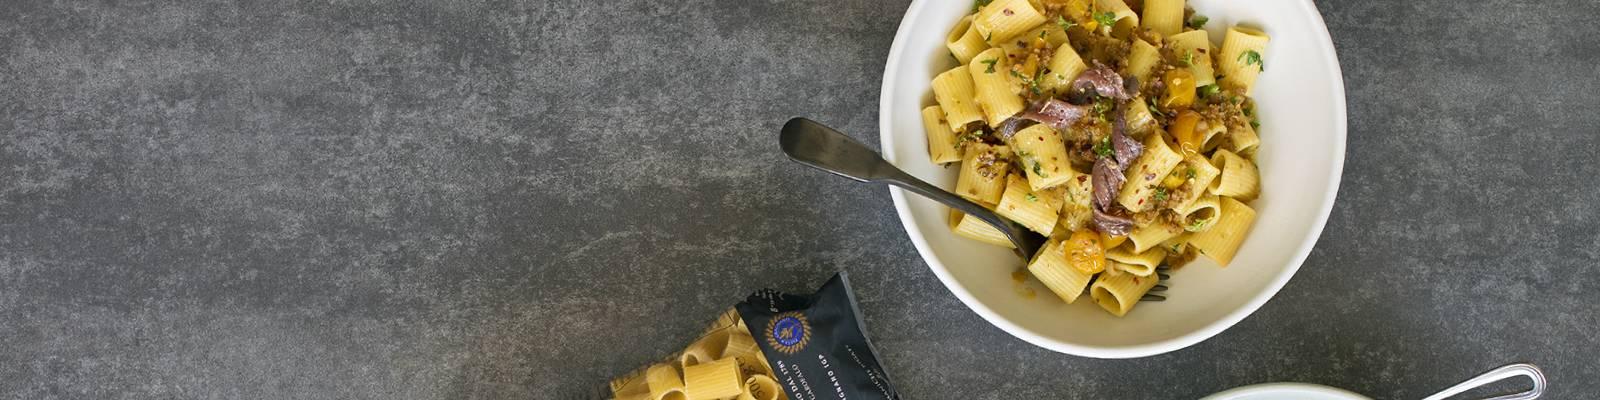 Pasta Garofalo - Mezze maniche with yellow tomatoes and anchovies